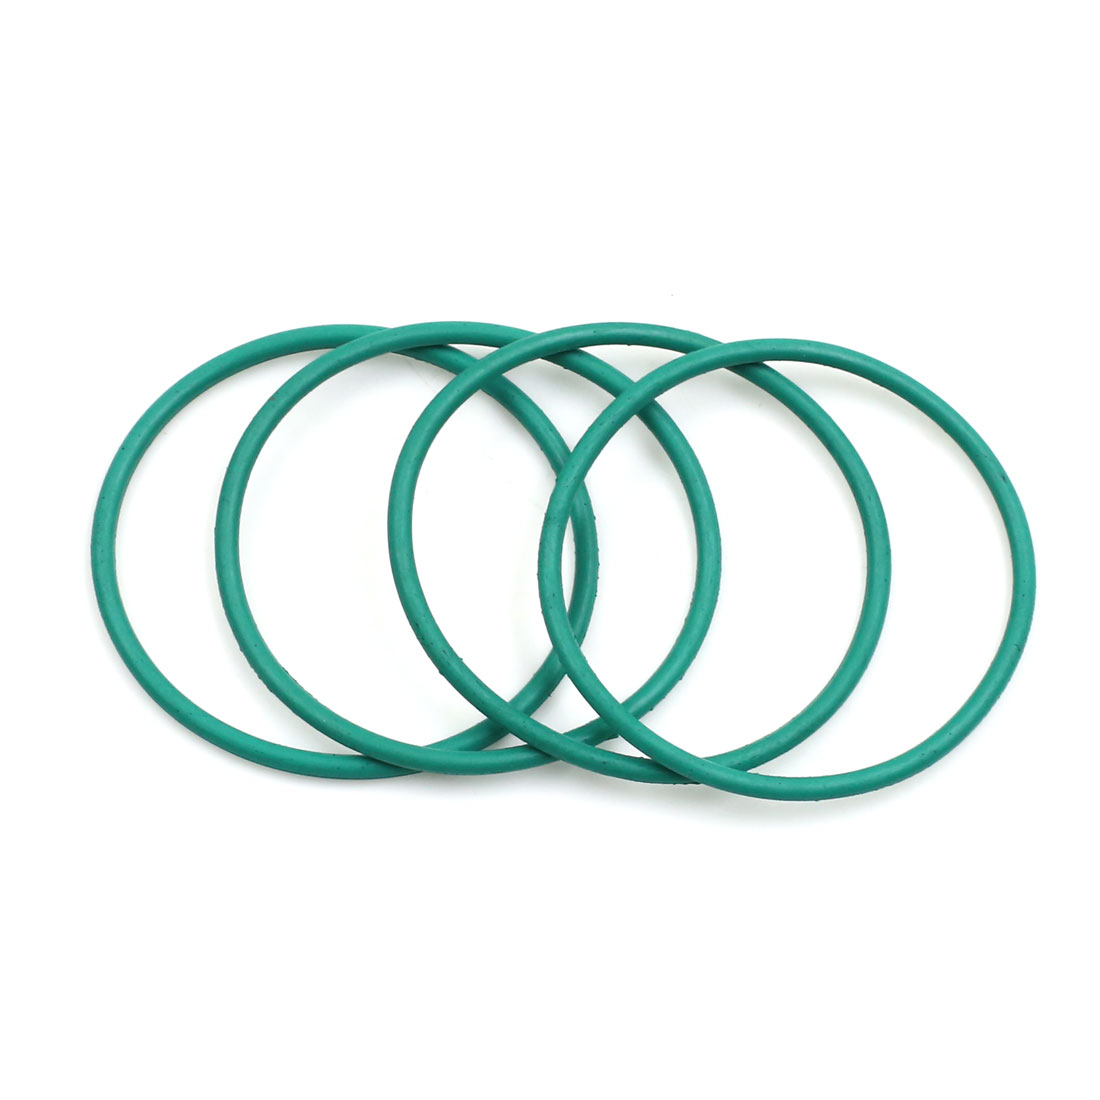 4pcs Green Universal FKM O-Ring Sealing Gasket Washer for Car 42mm x 2mm